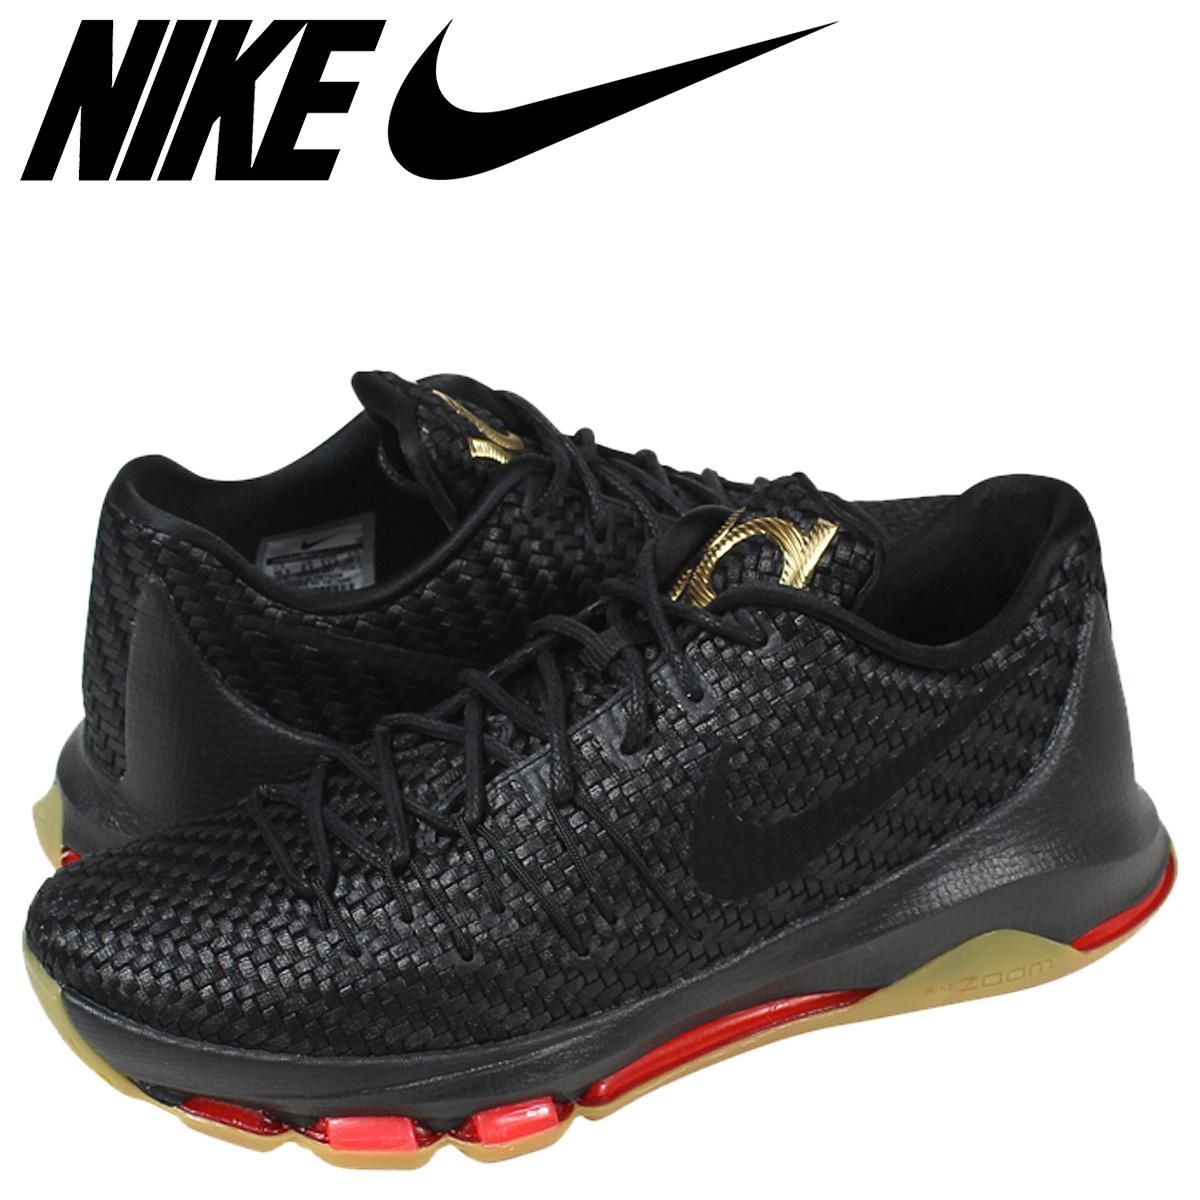 63ff863ca077 ALLSPORTS  Nike NIKE sneakers KD 8 EXT 806393-001 black mens ...